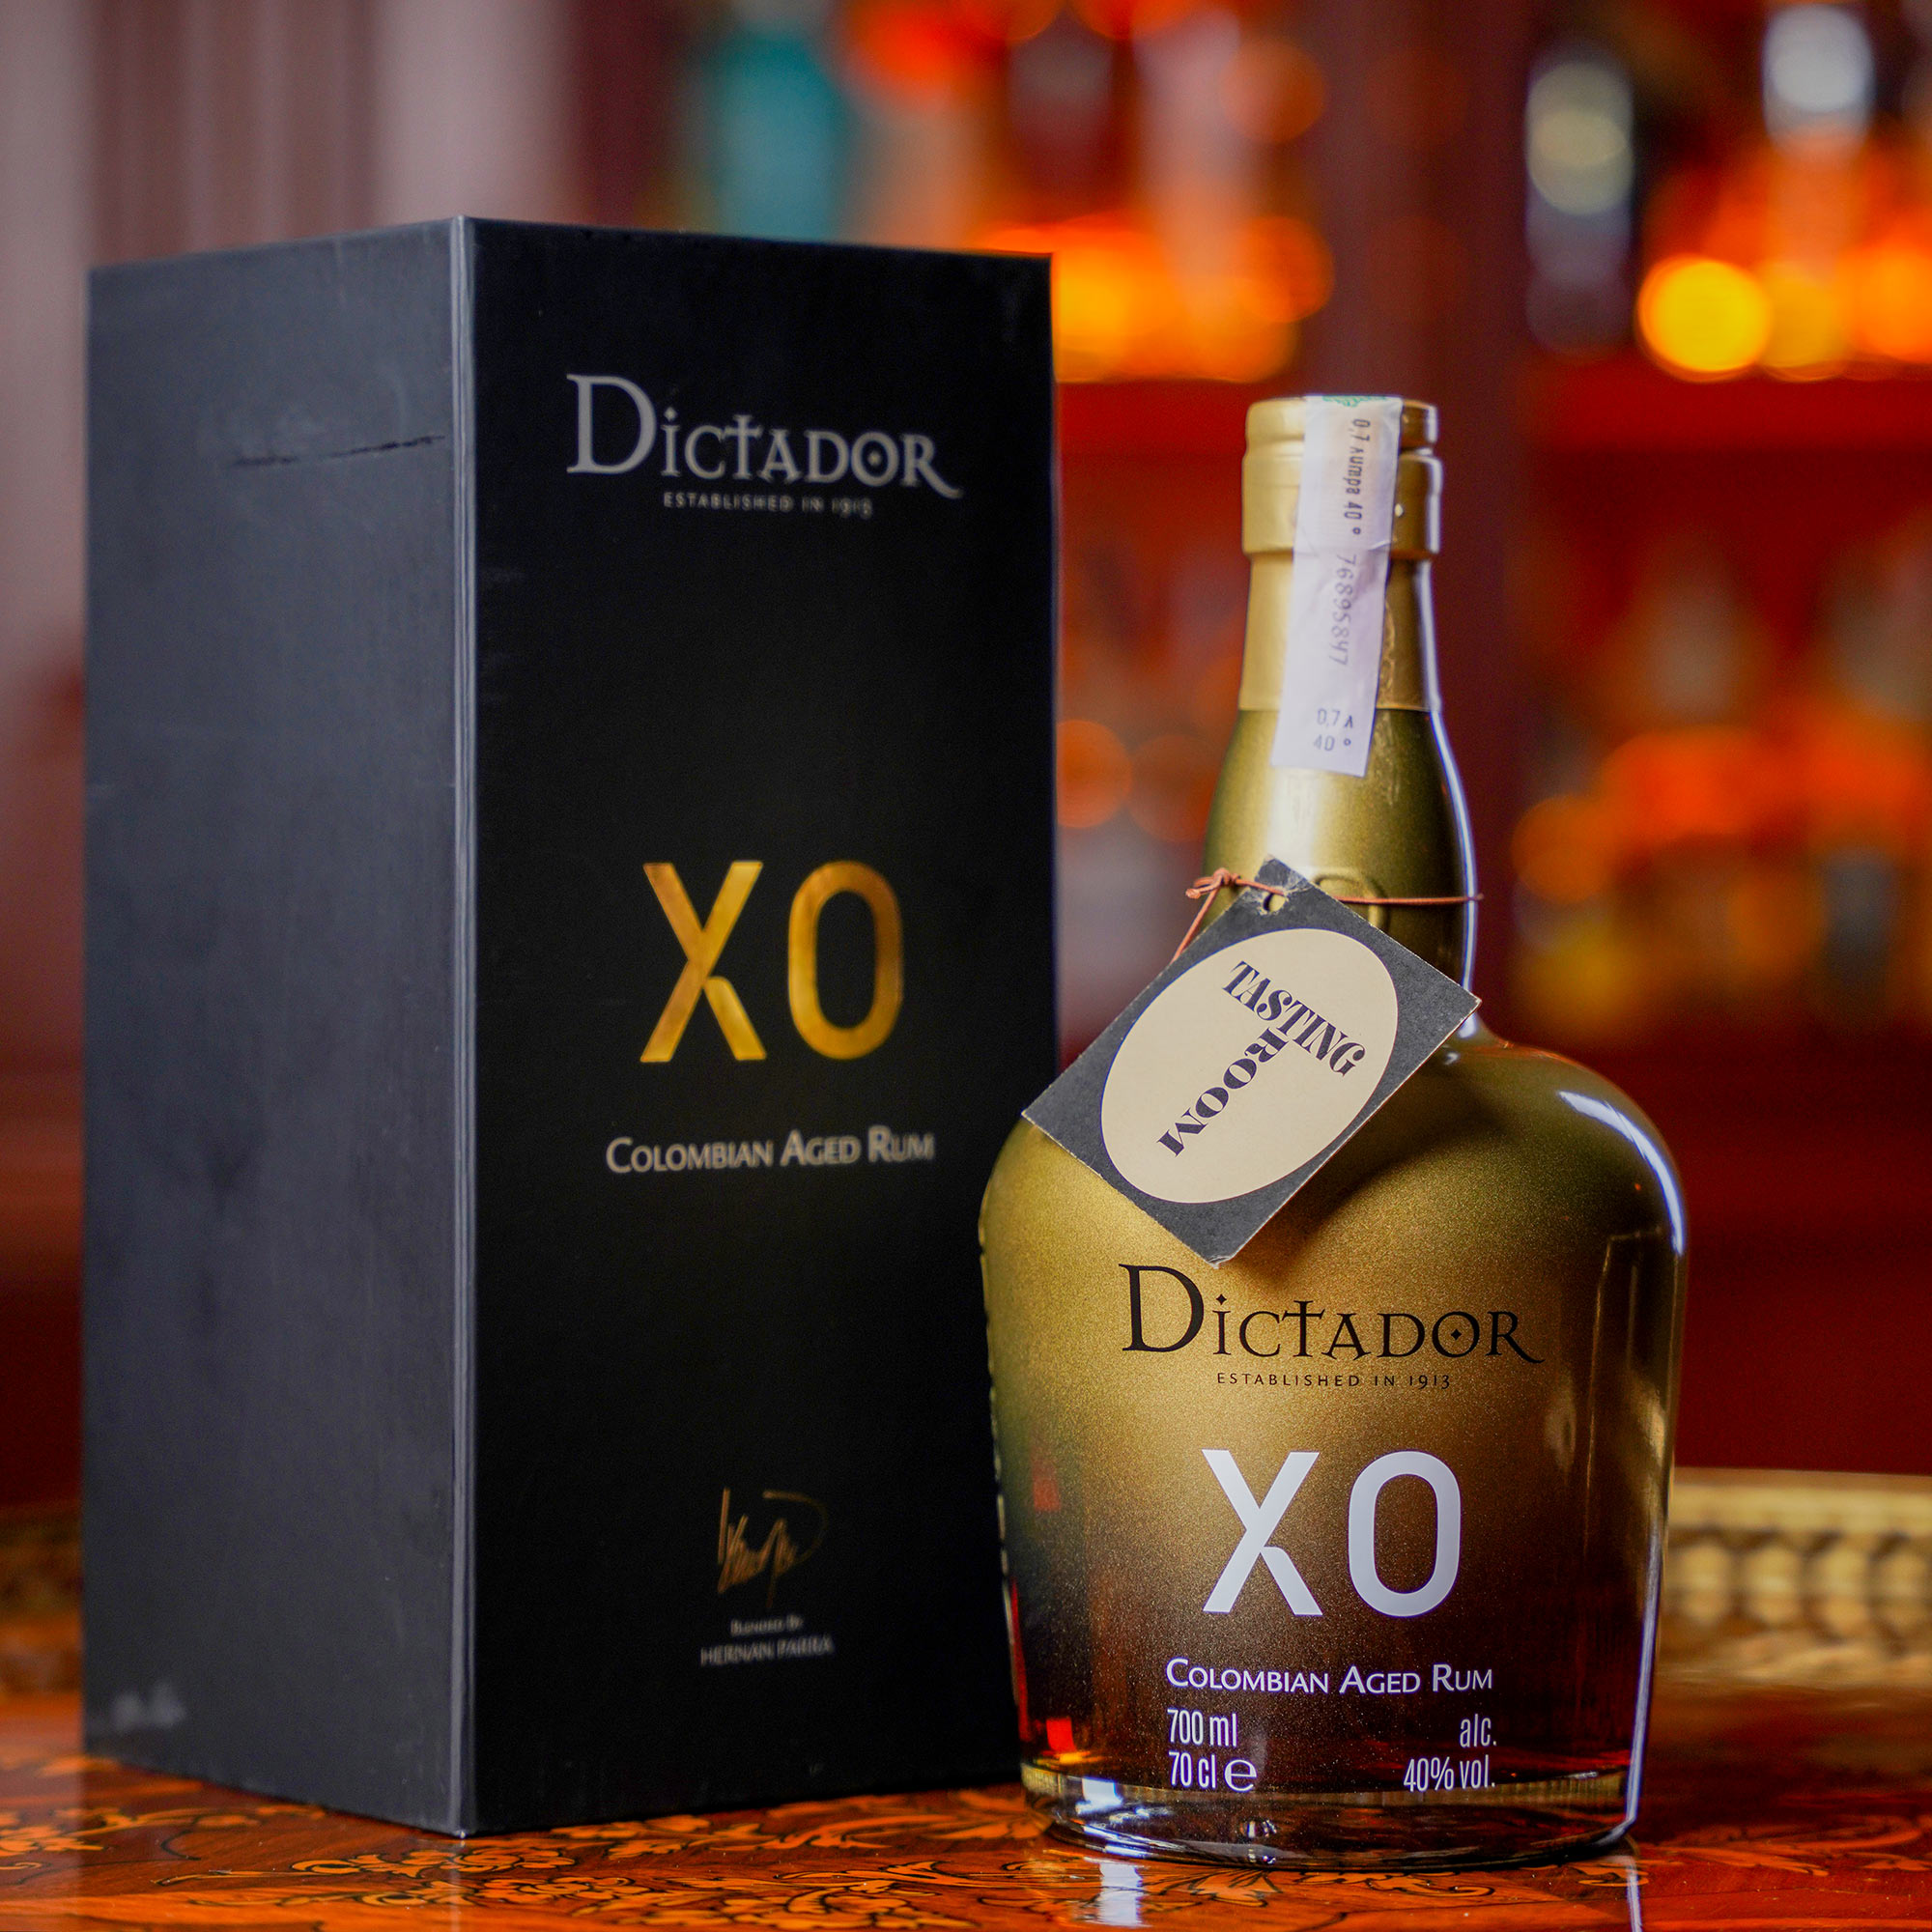 Dictador XO Perpetual /Диктадор XO Перпетуал